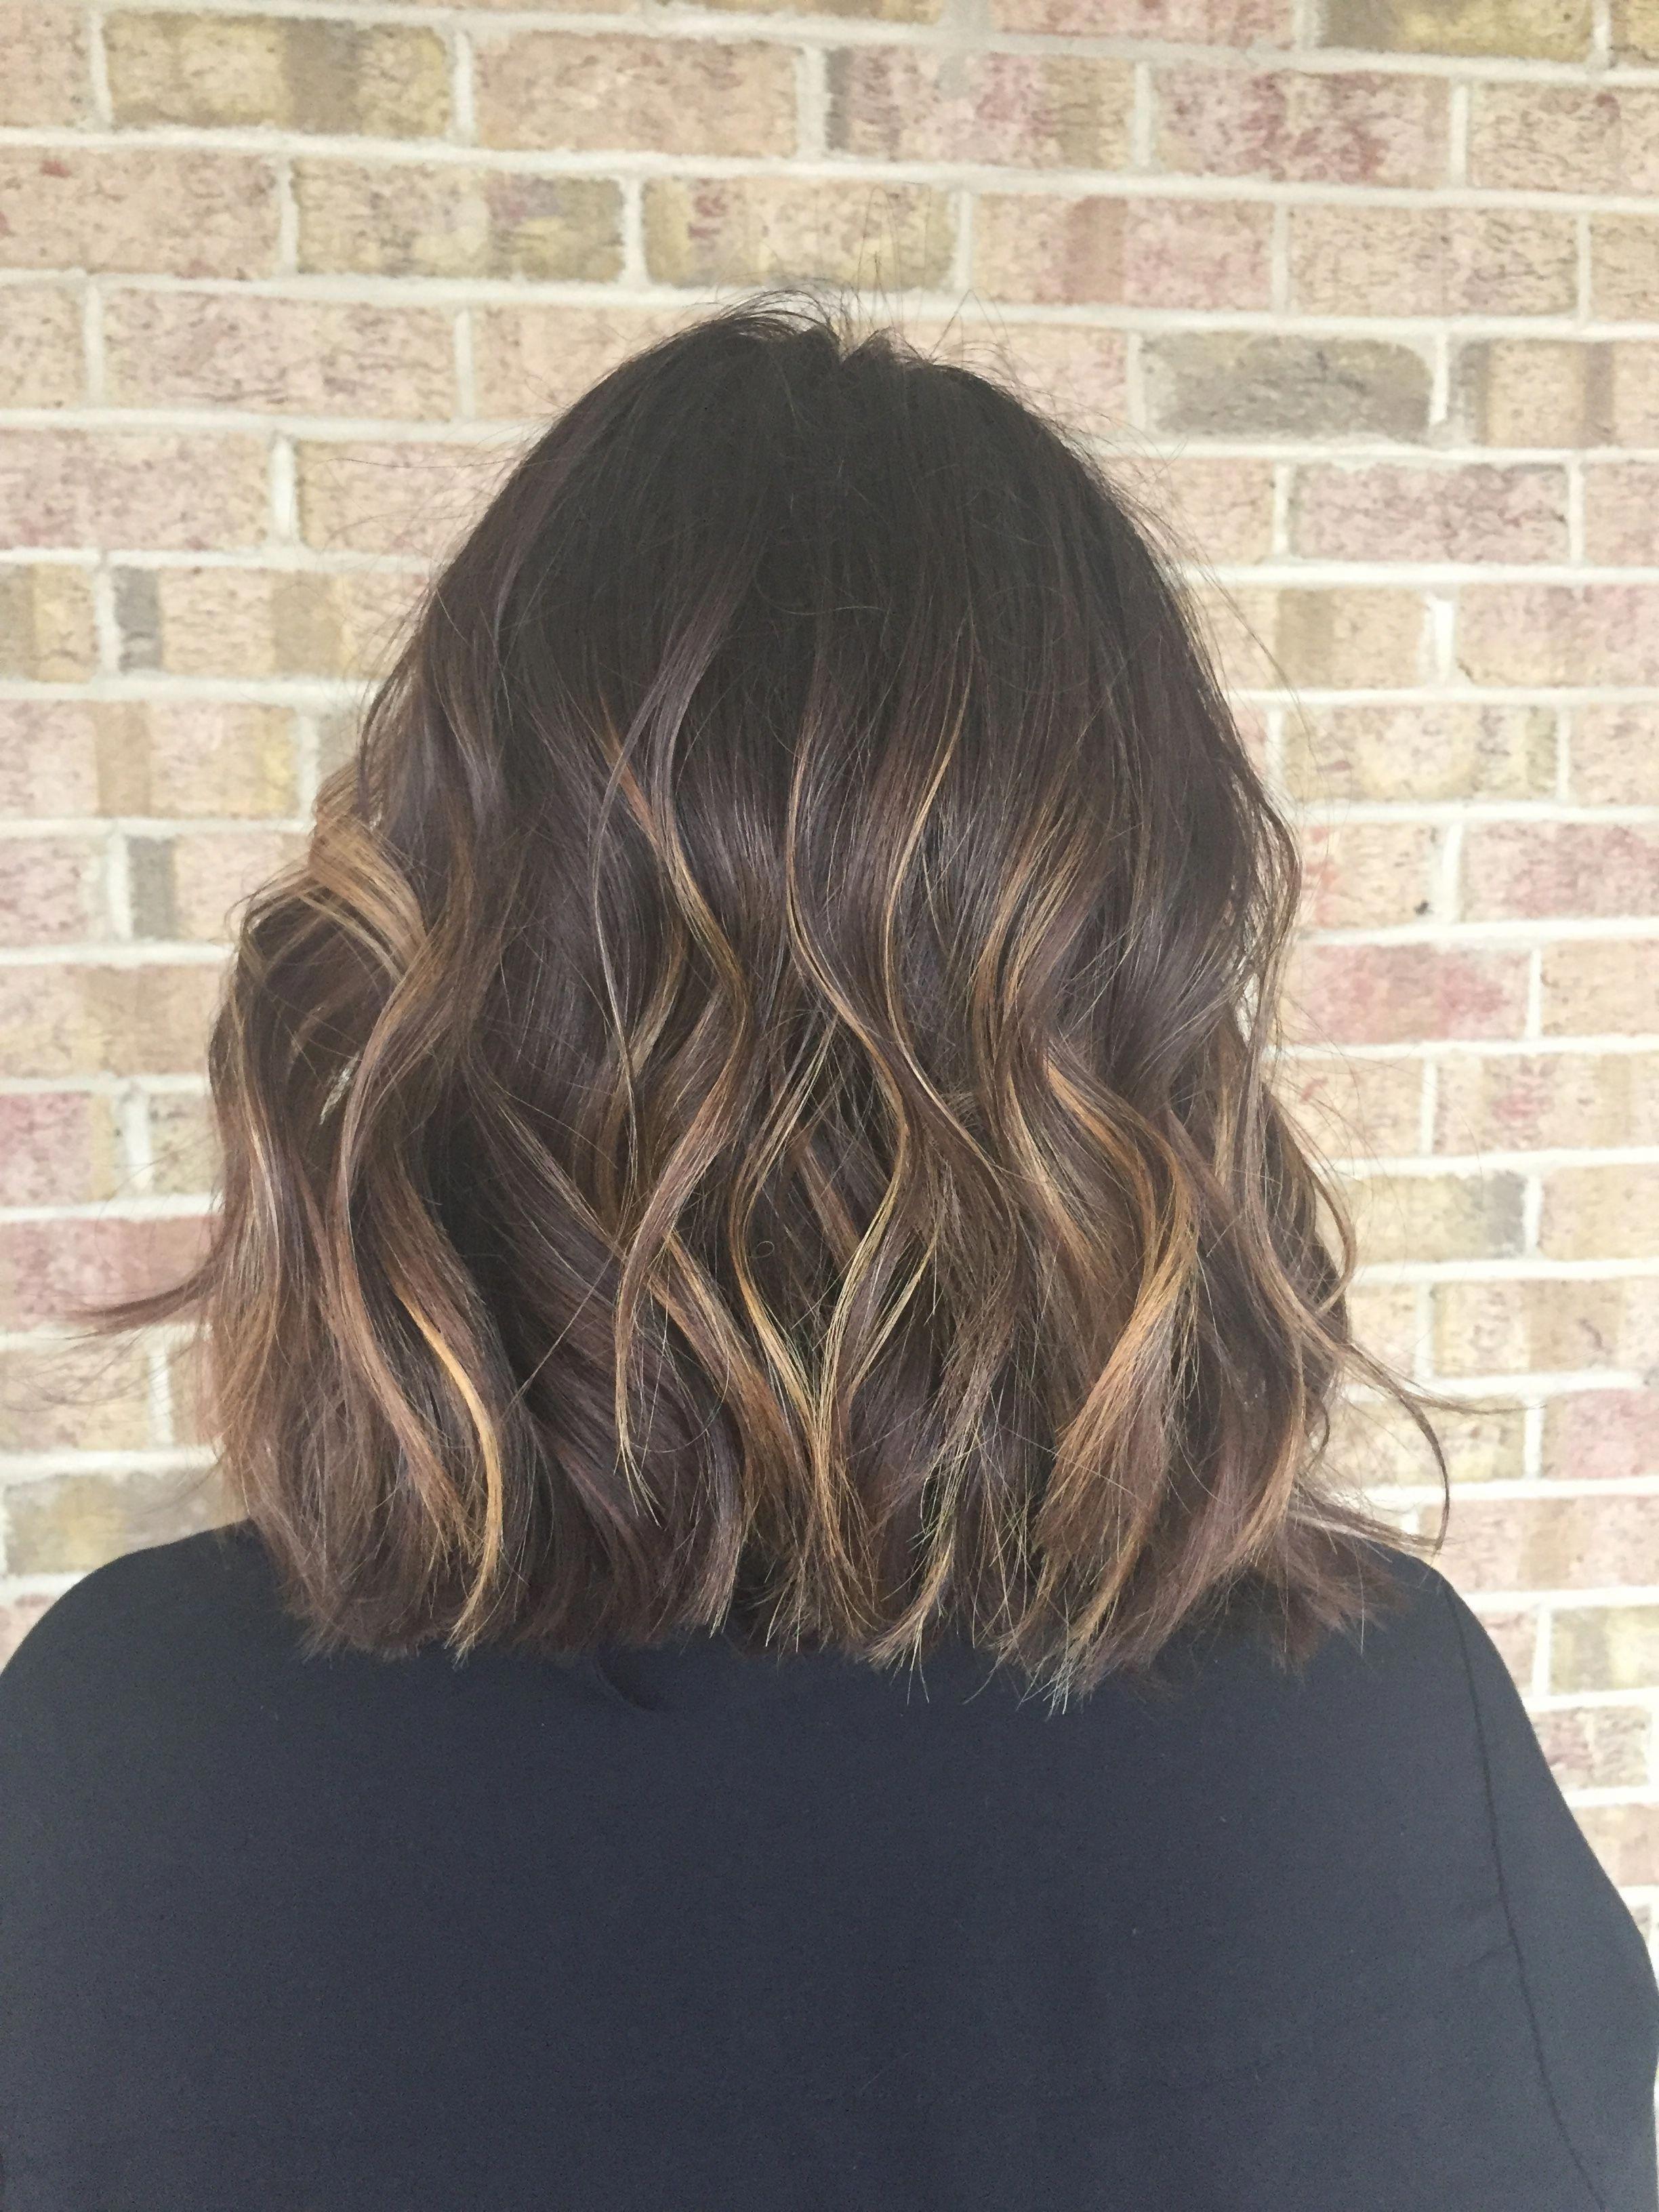 Balayage for dark brown hair. Hair by Chelsea Pelfrey. Short